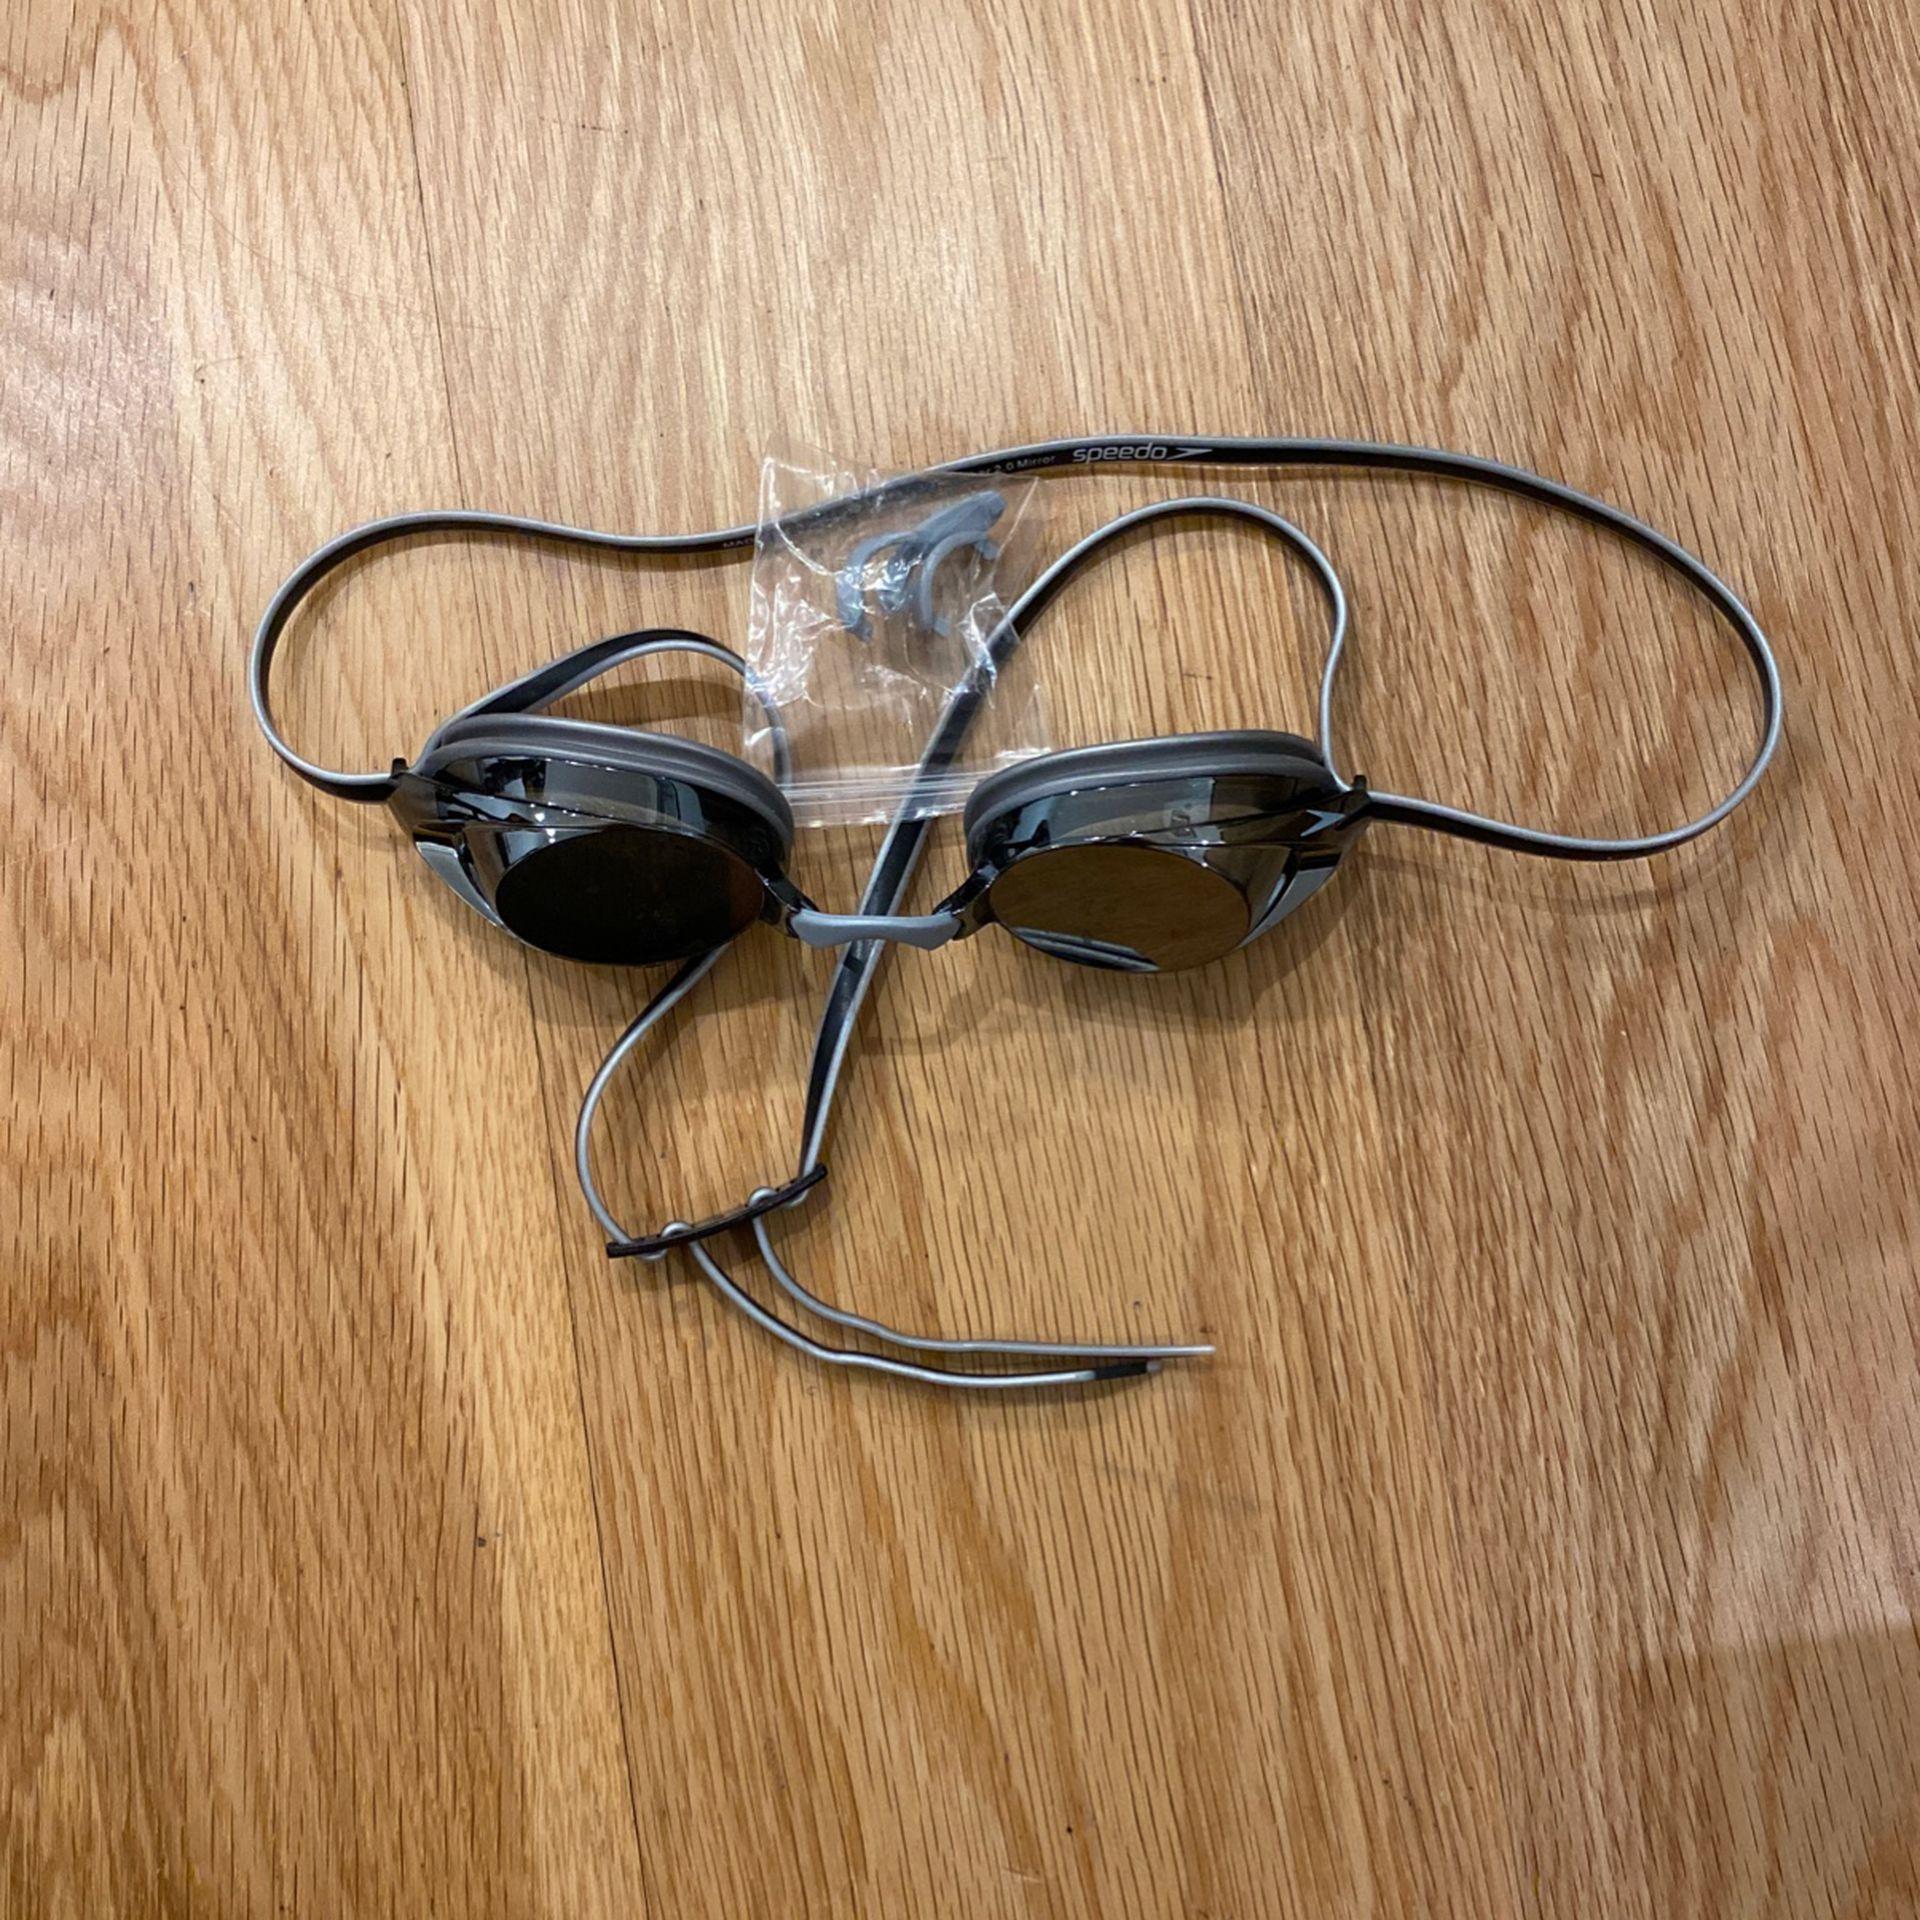 Speedo Swim Goggles - Silver reflective / Black